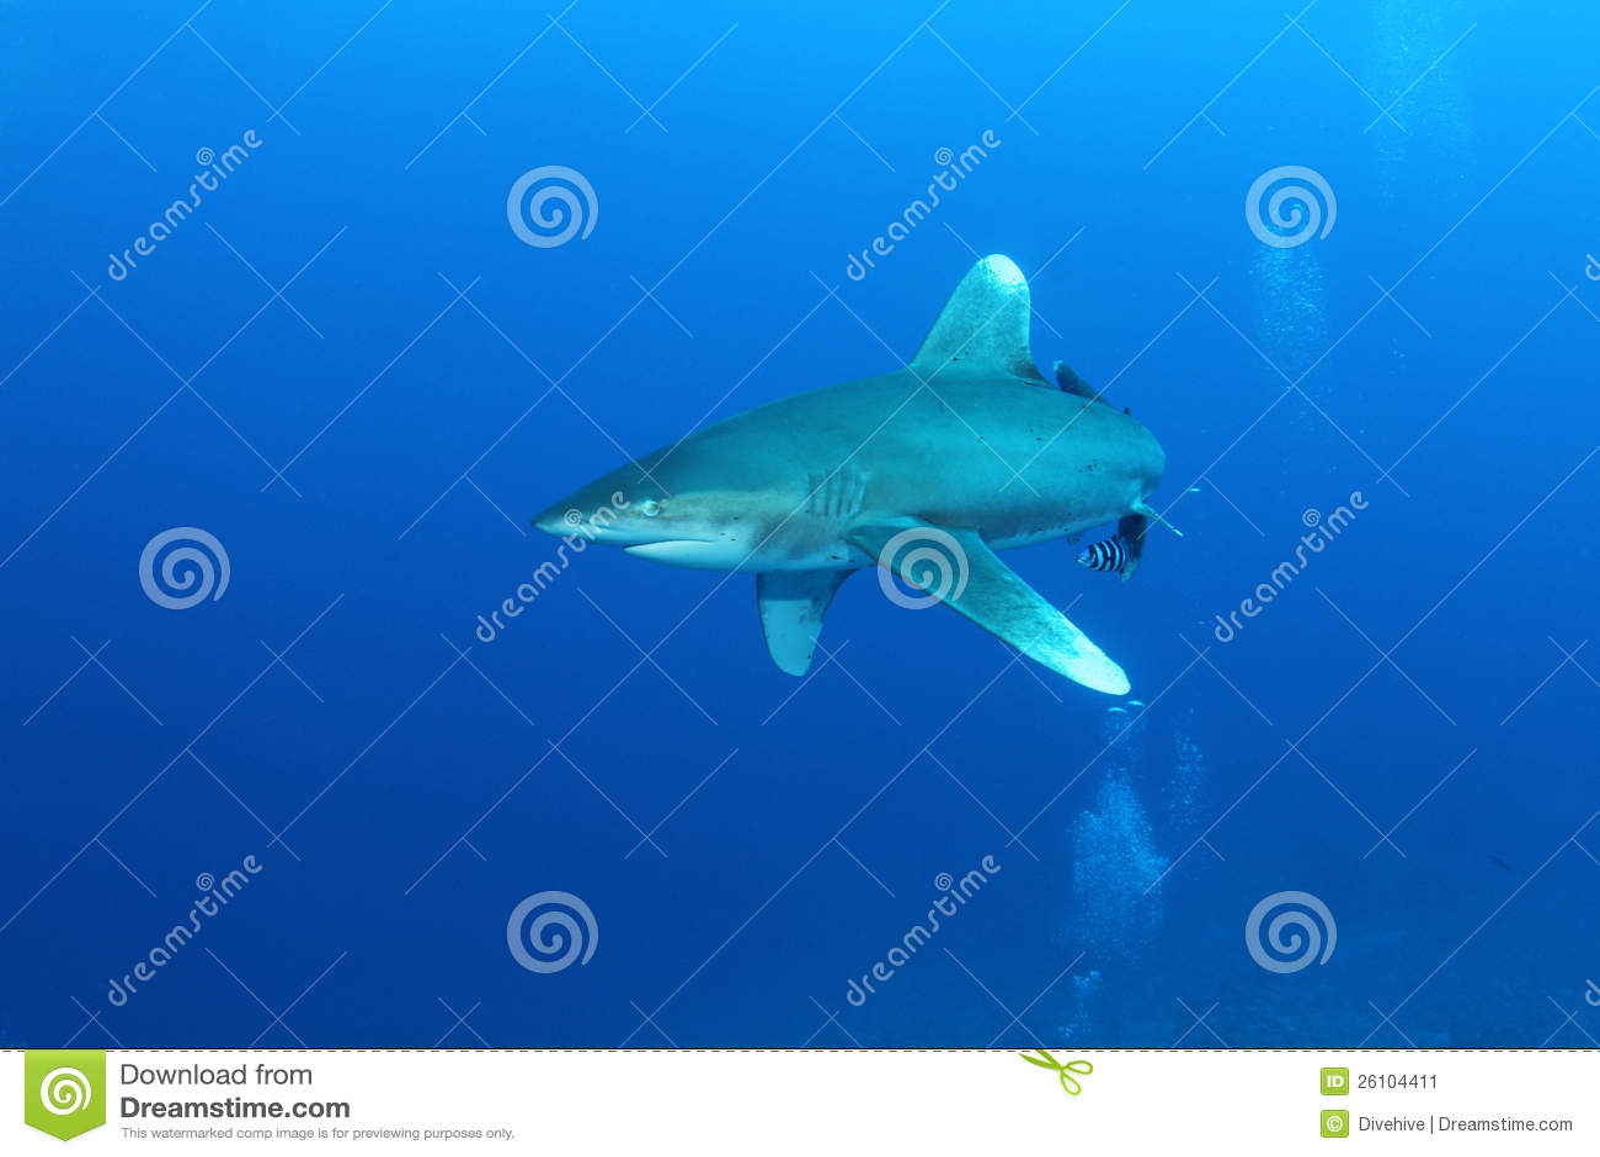 Oceanic White Tip shark (Carcharinus longimanus)